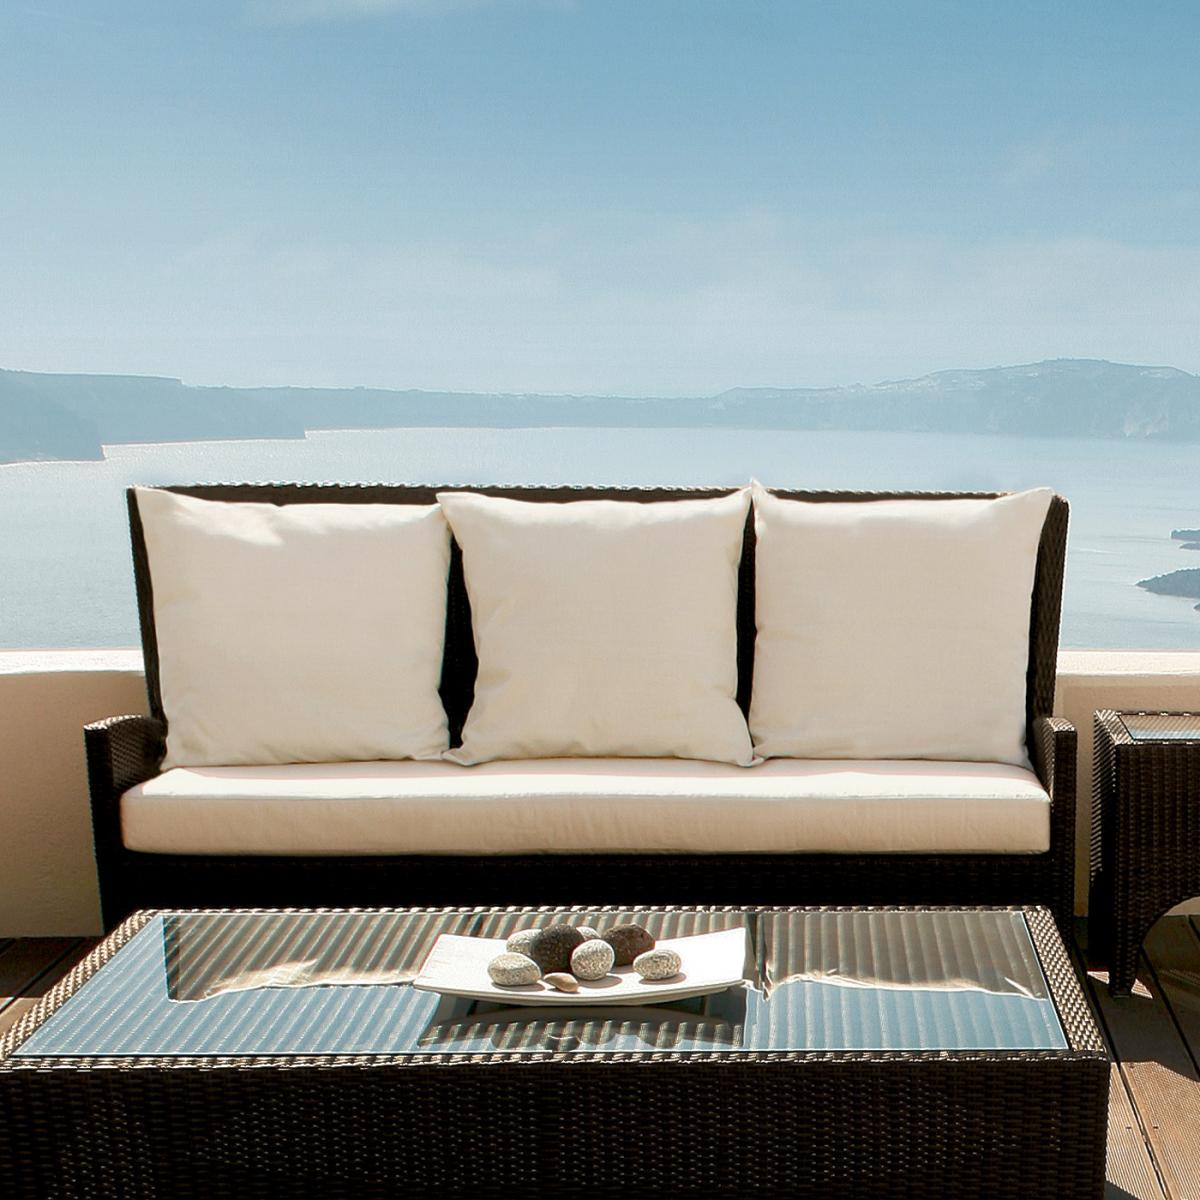 barlow tyrie savannah deep seated outdoor armchair - clifton nurseries barlow tyrie savannah three seater sofa outdoor